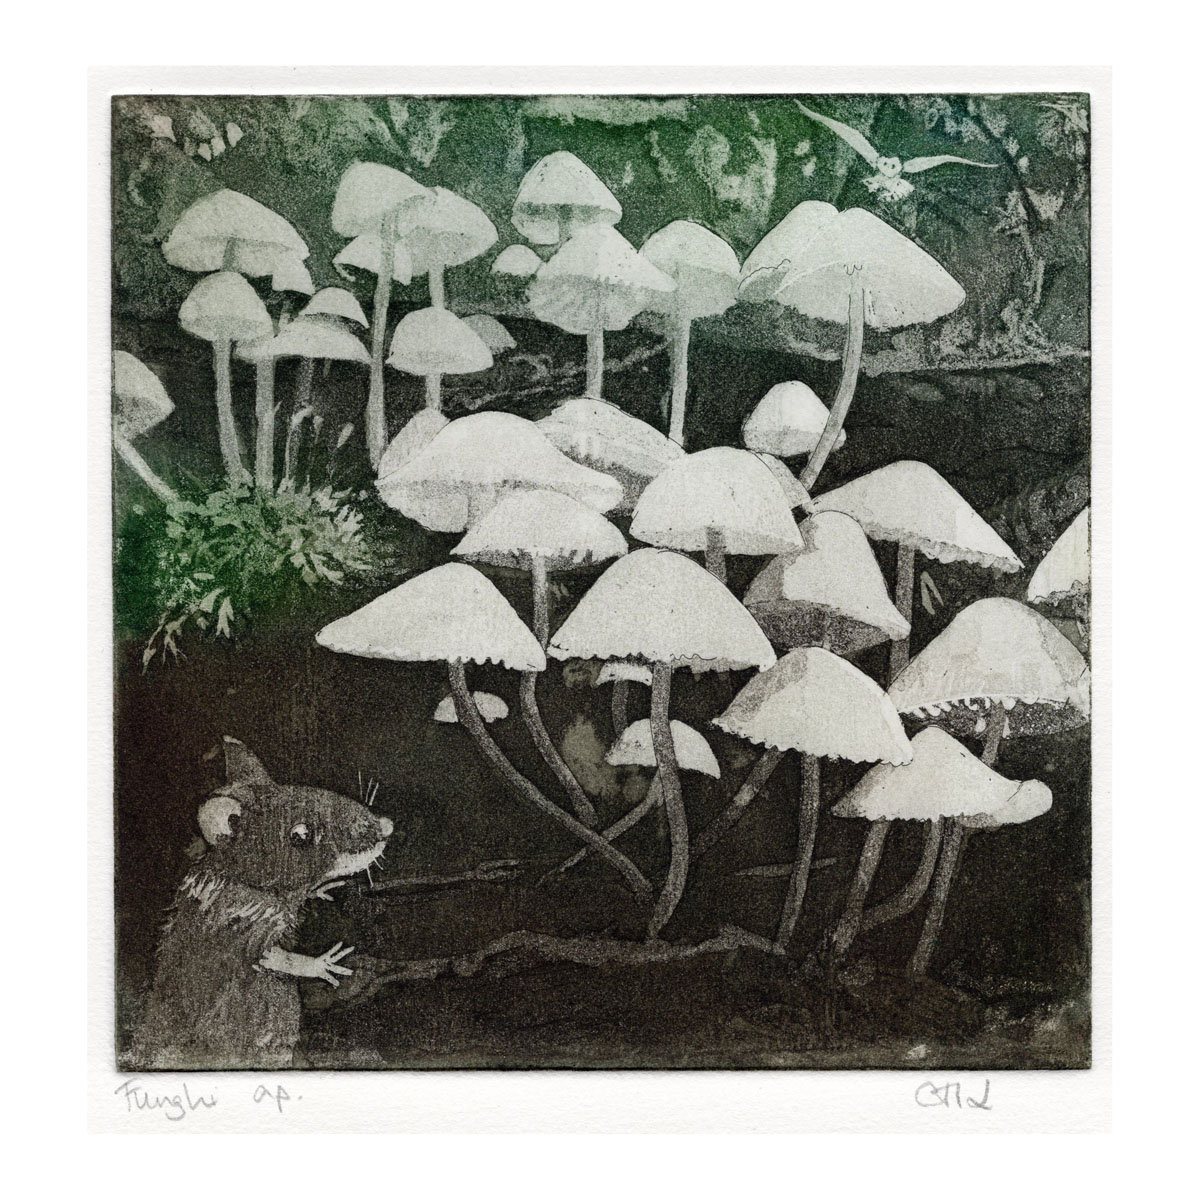 LON177, Funghi, a/p